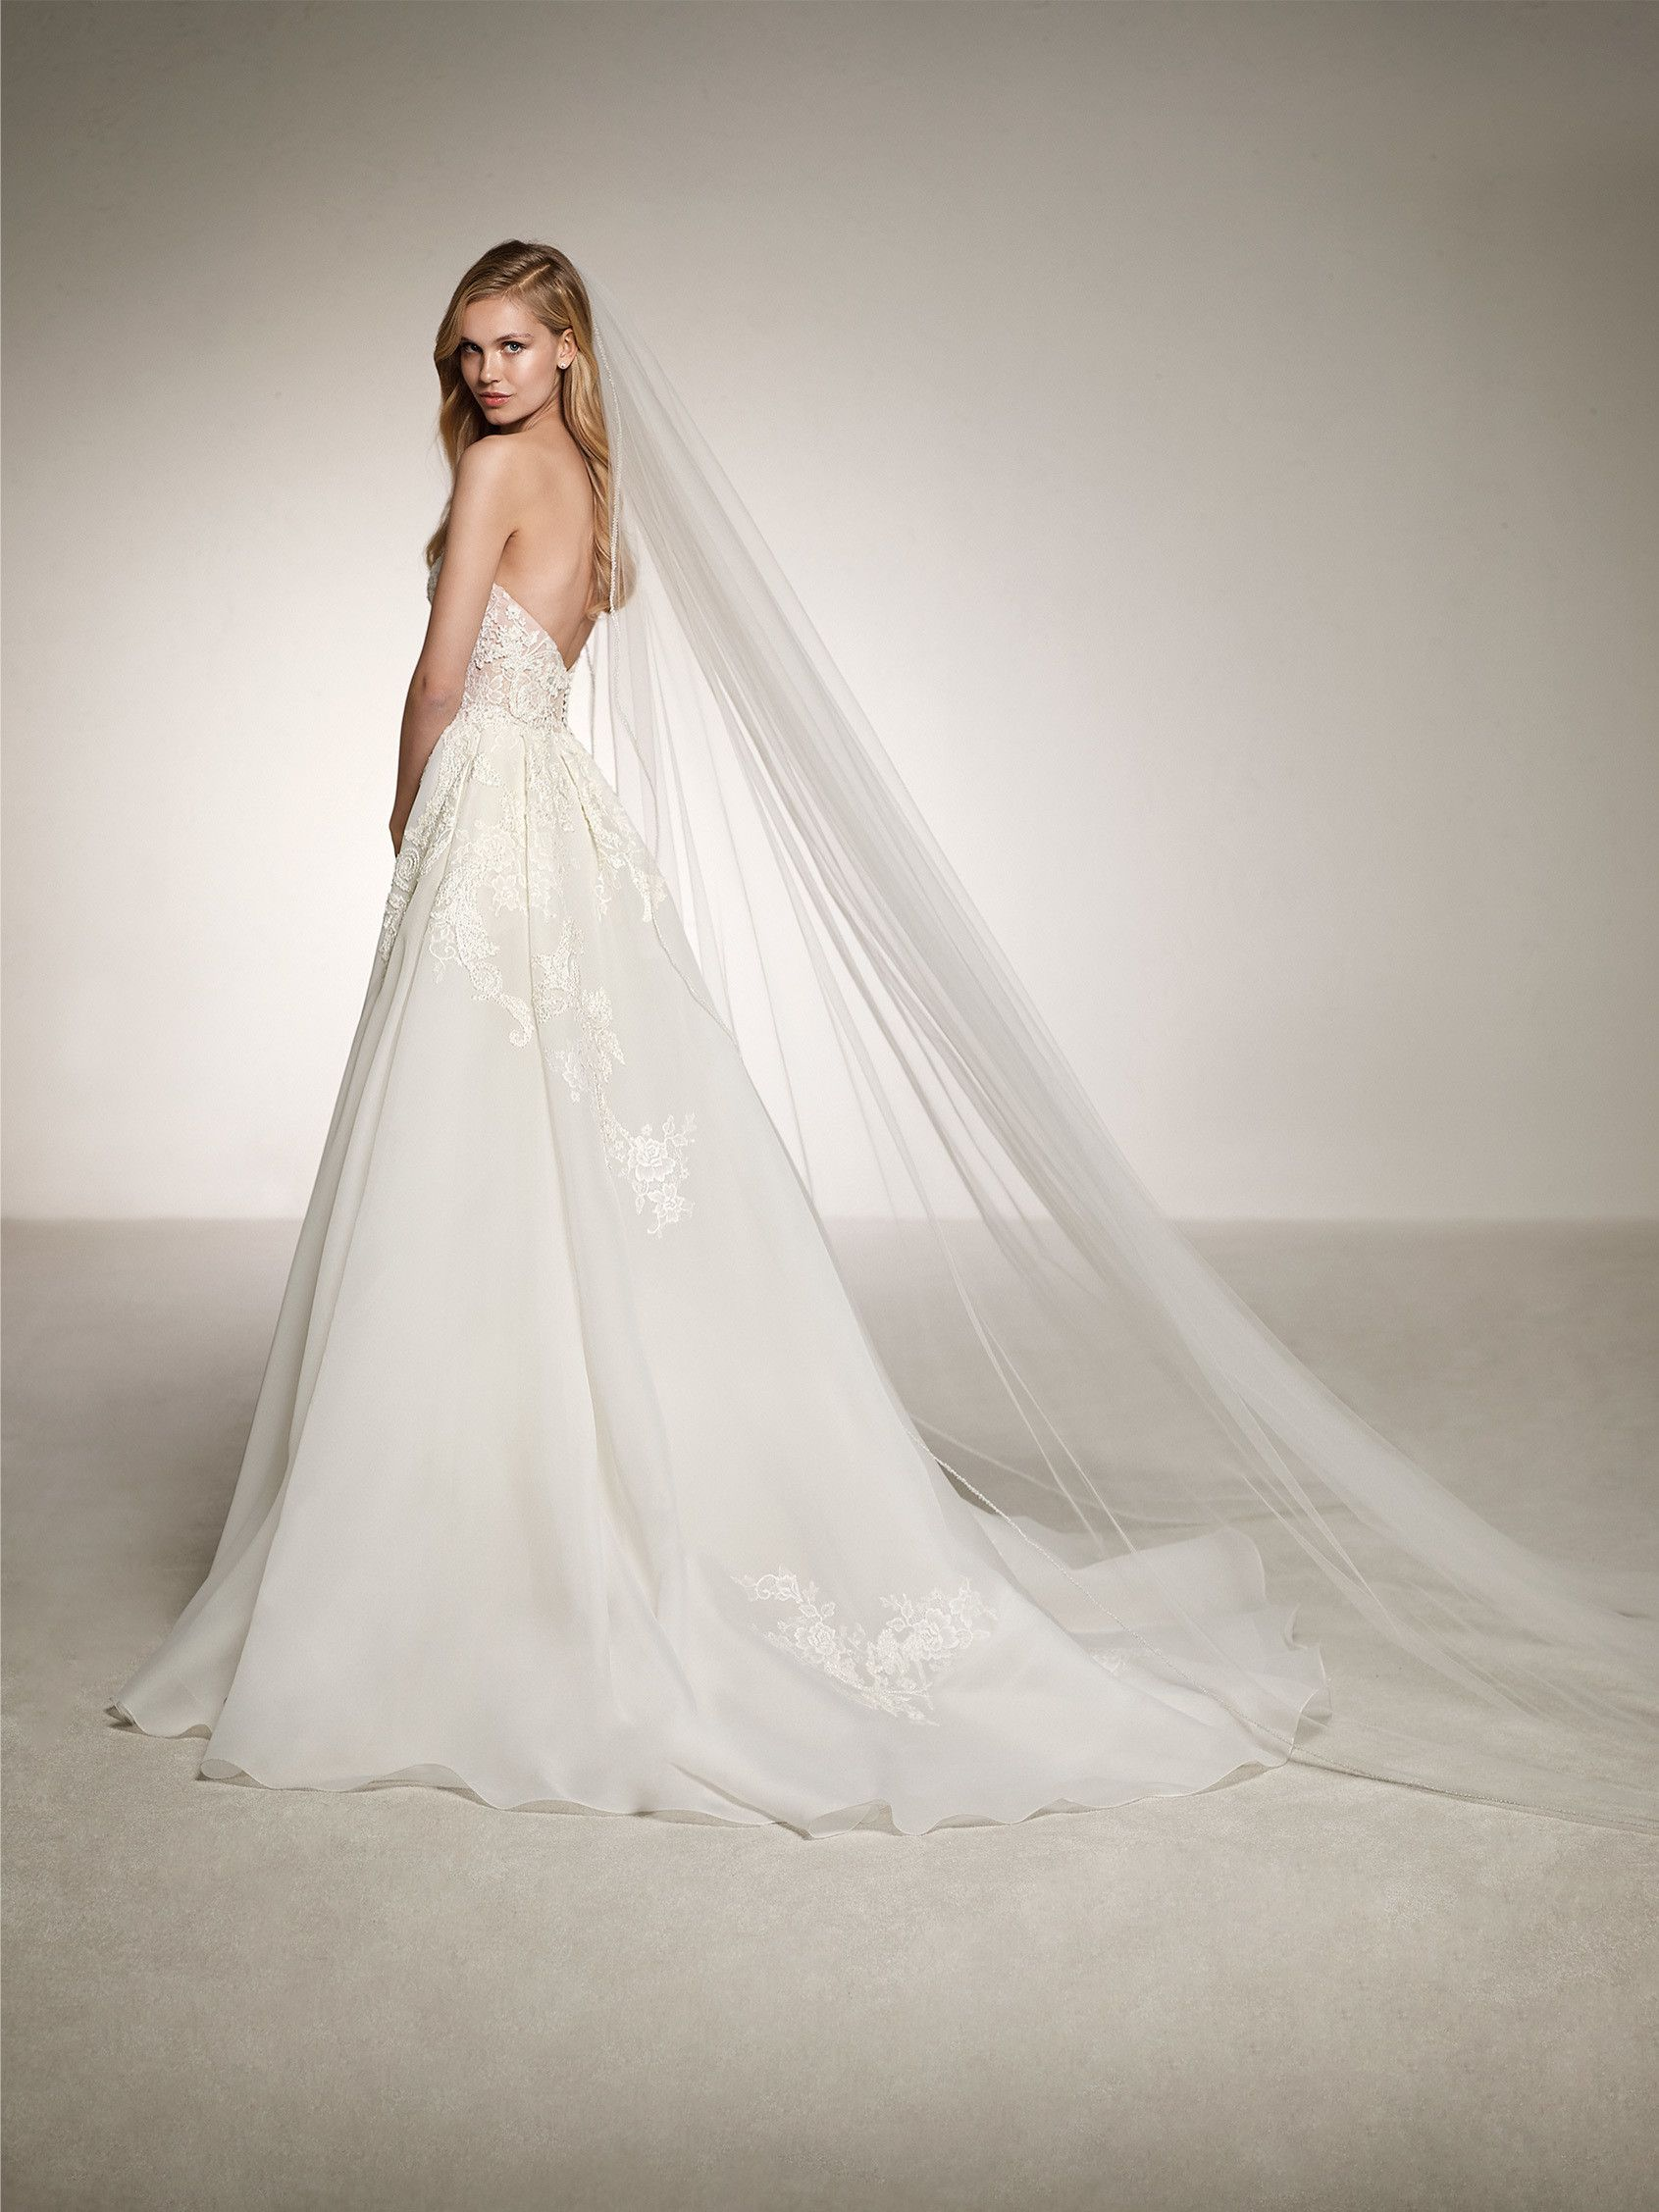 4755581bc65 wedding dress with lace neckline